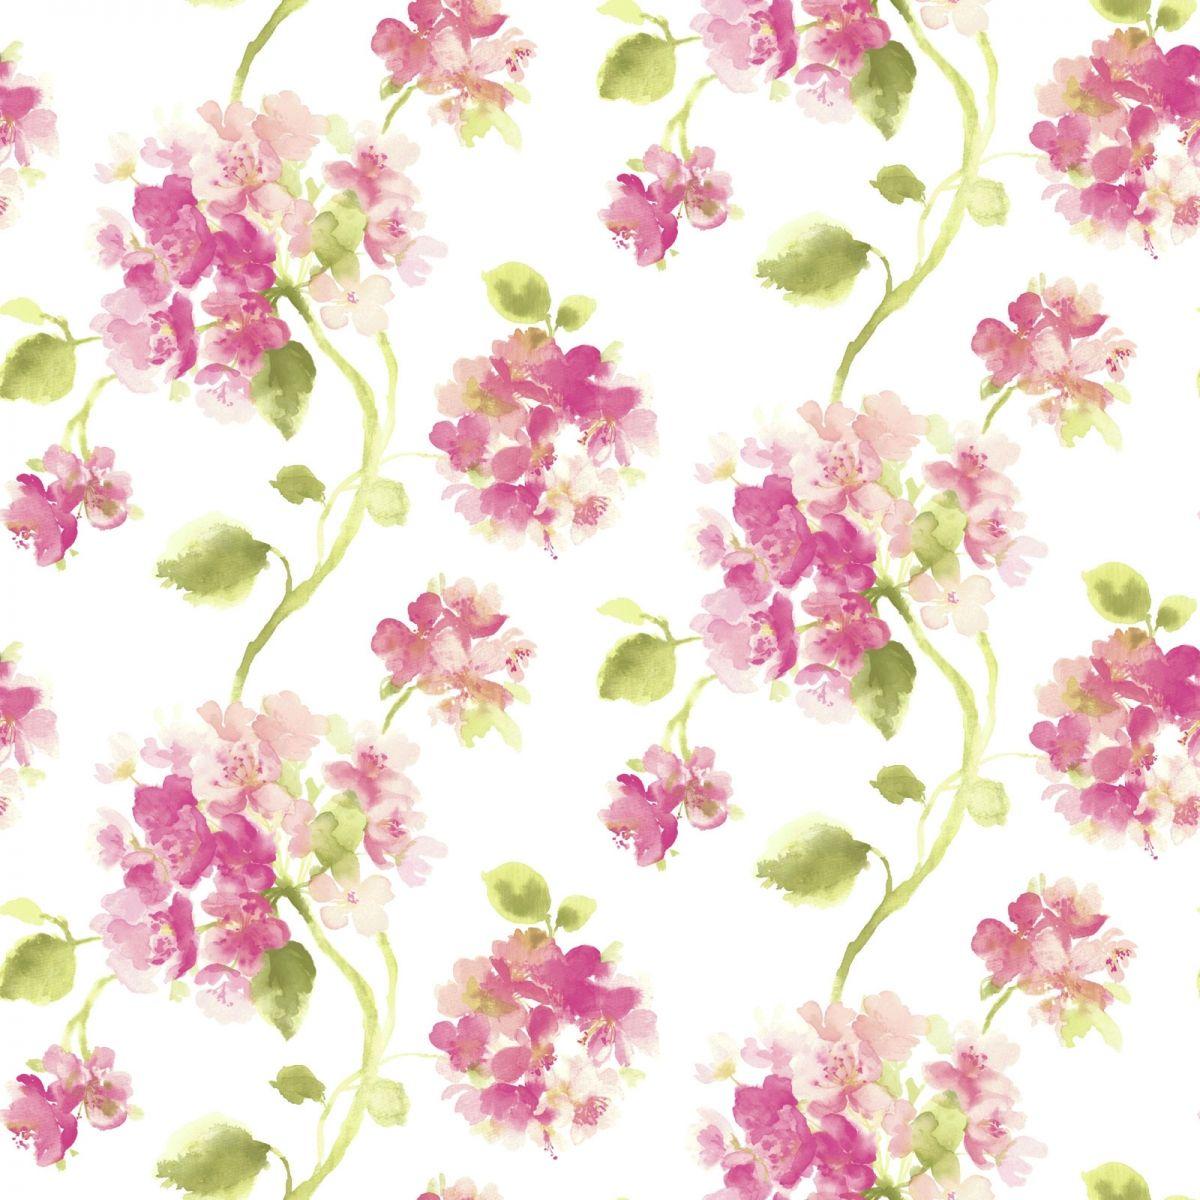 Aquarelle Pink Floral Wallpaper Pink floral wallpaper